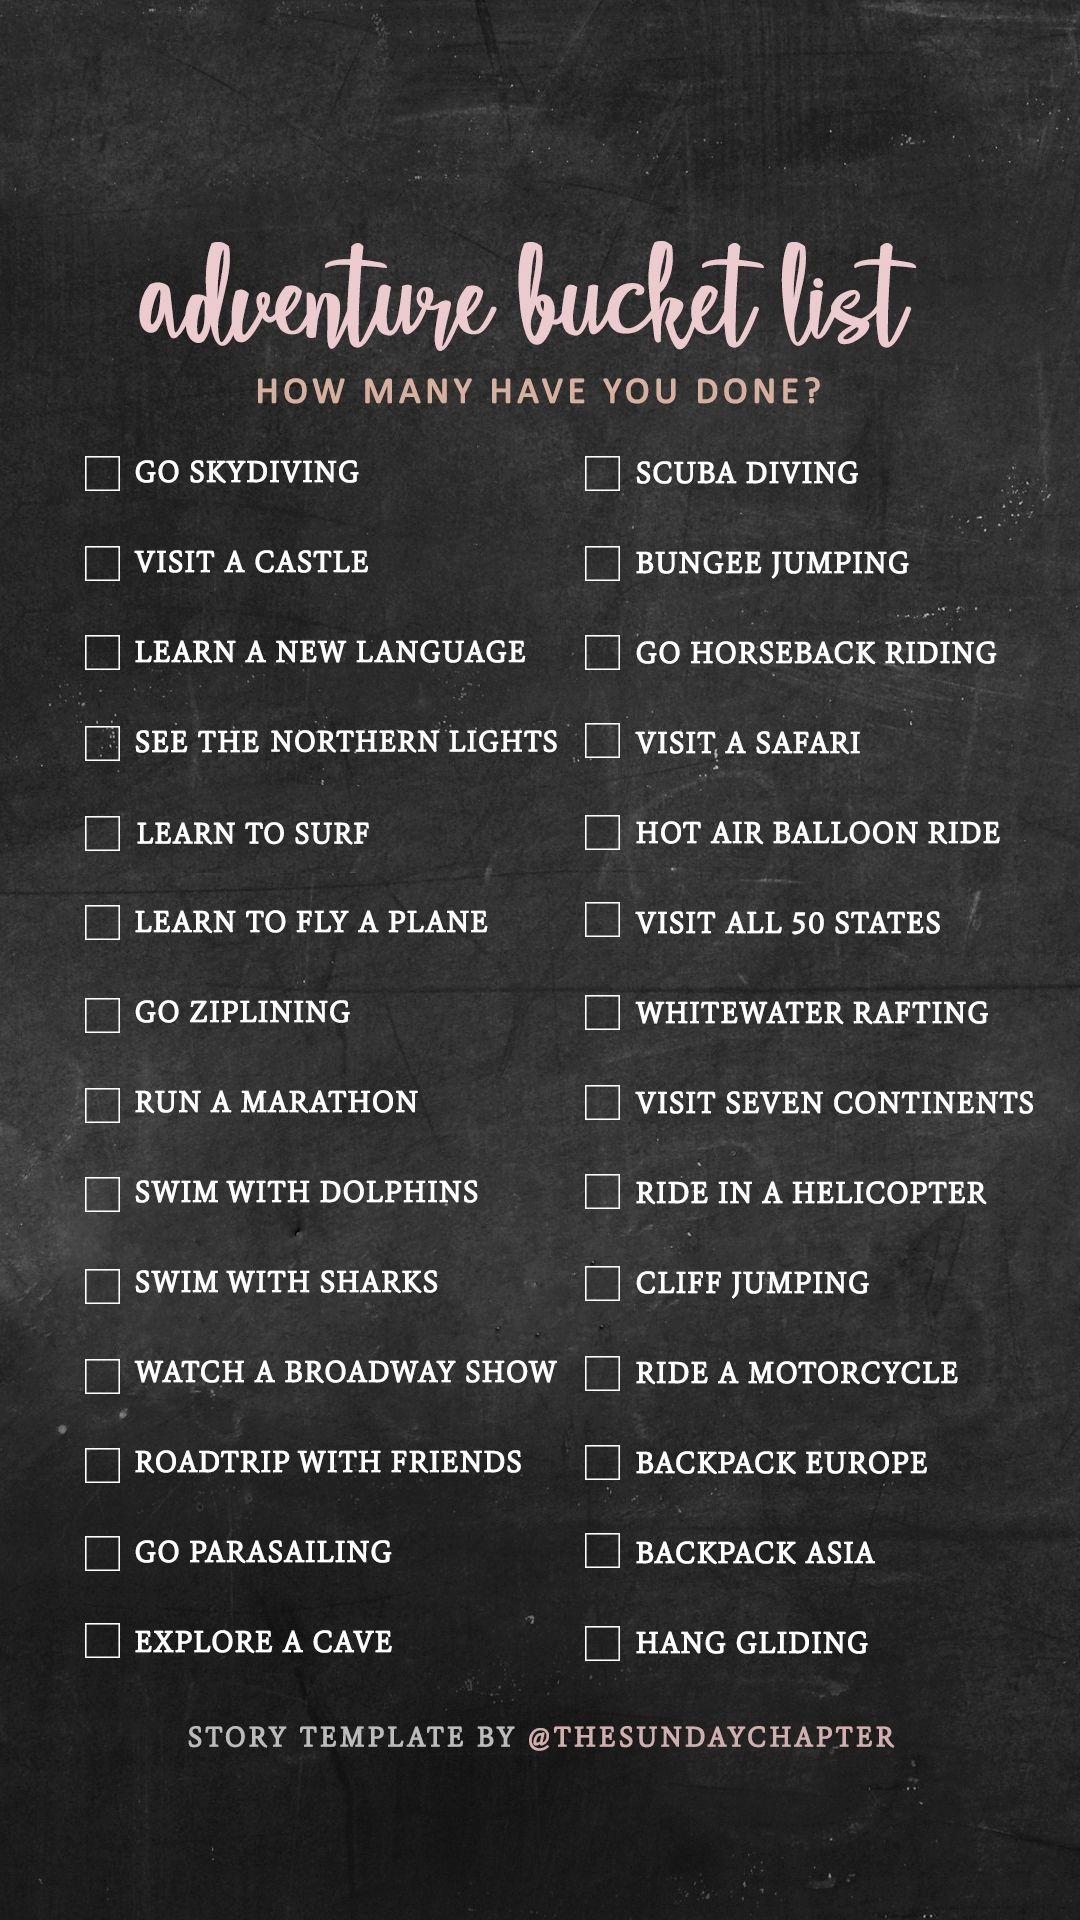 adventure travel bucket list challenge instagram story template